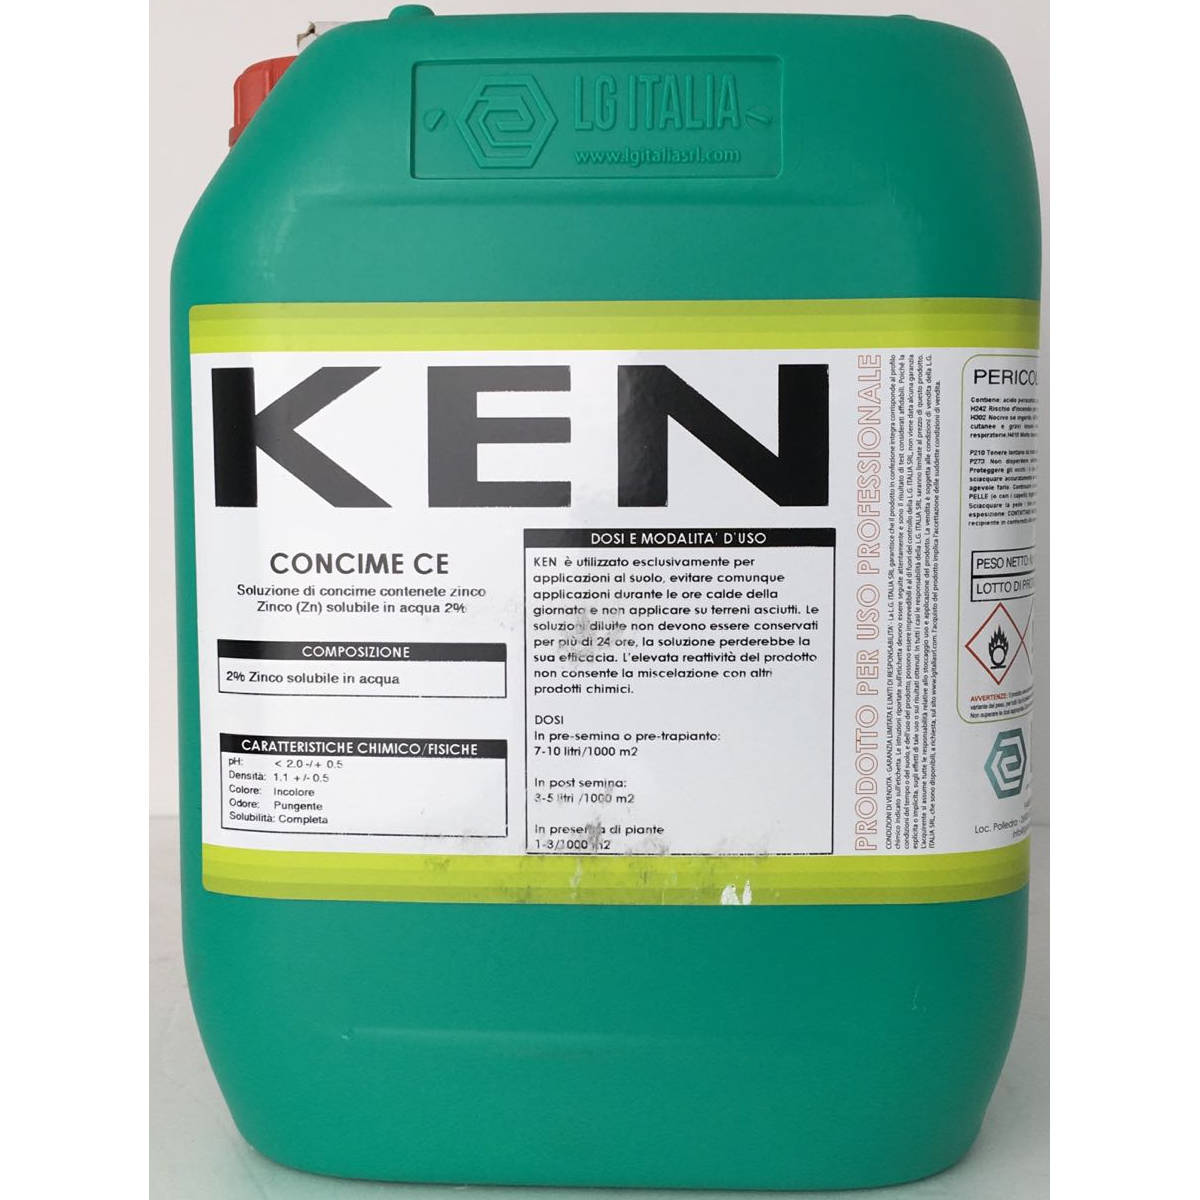 ken-soluzione-di-concime-a-base-di-zinco-zn